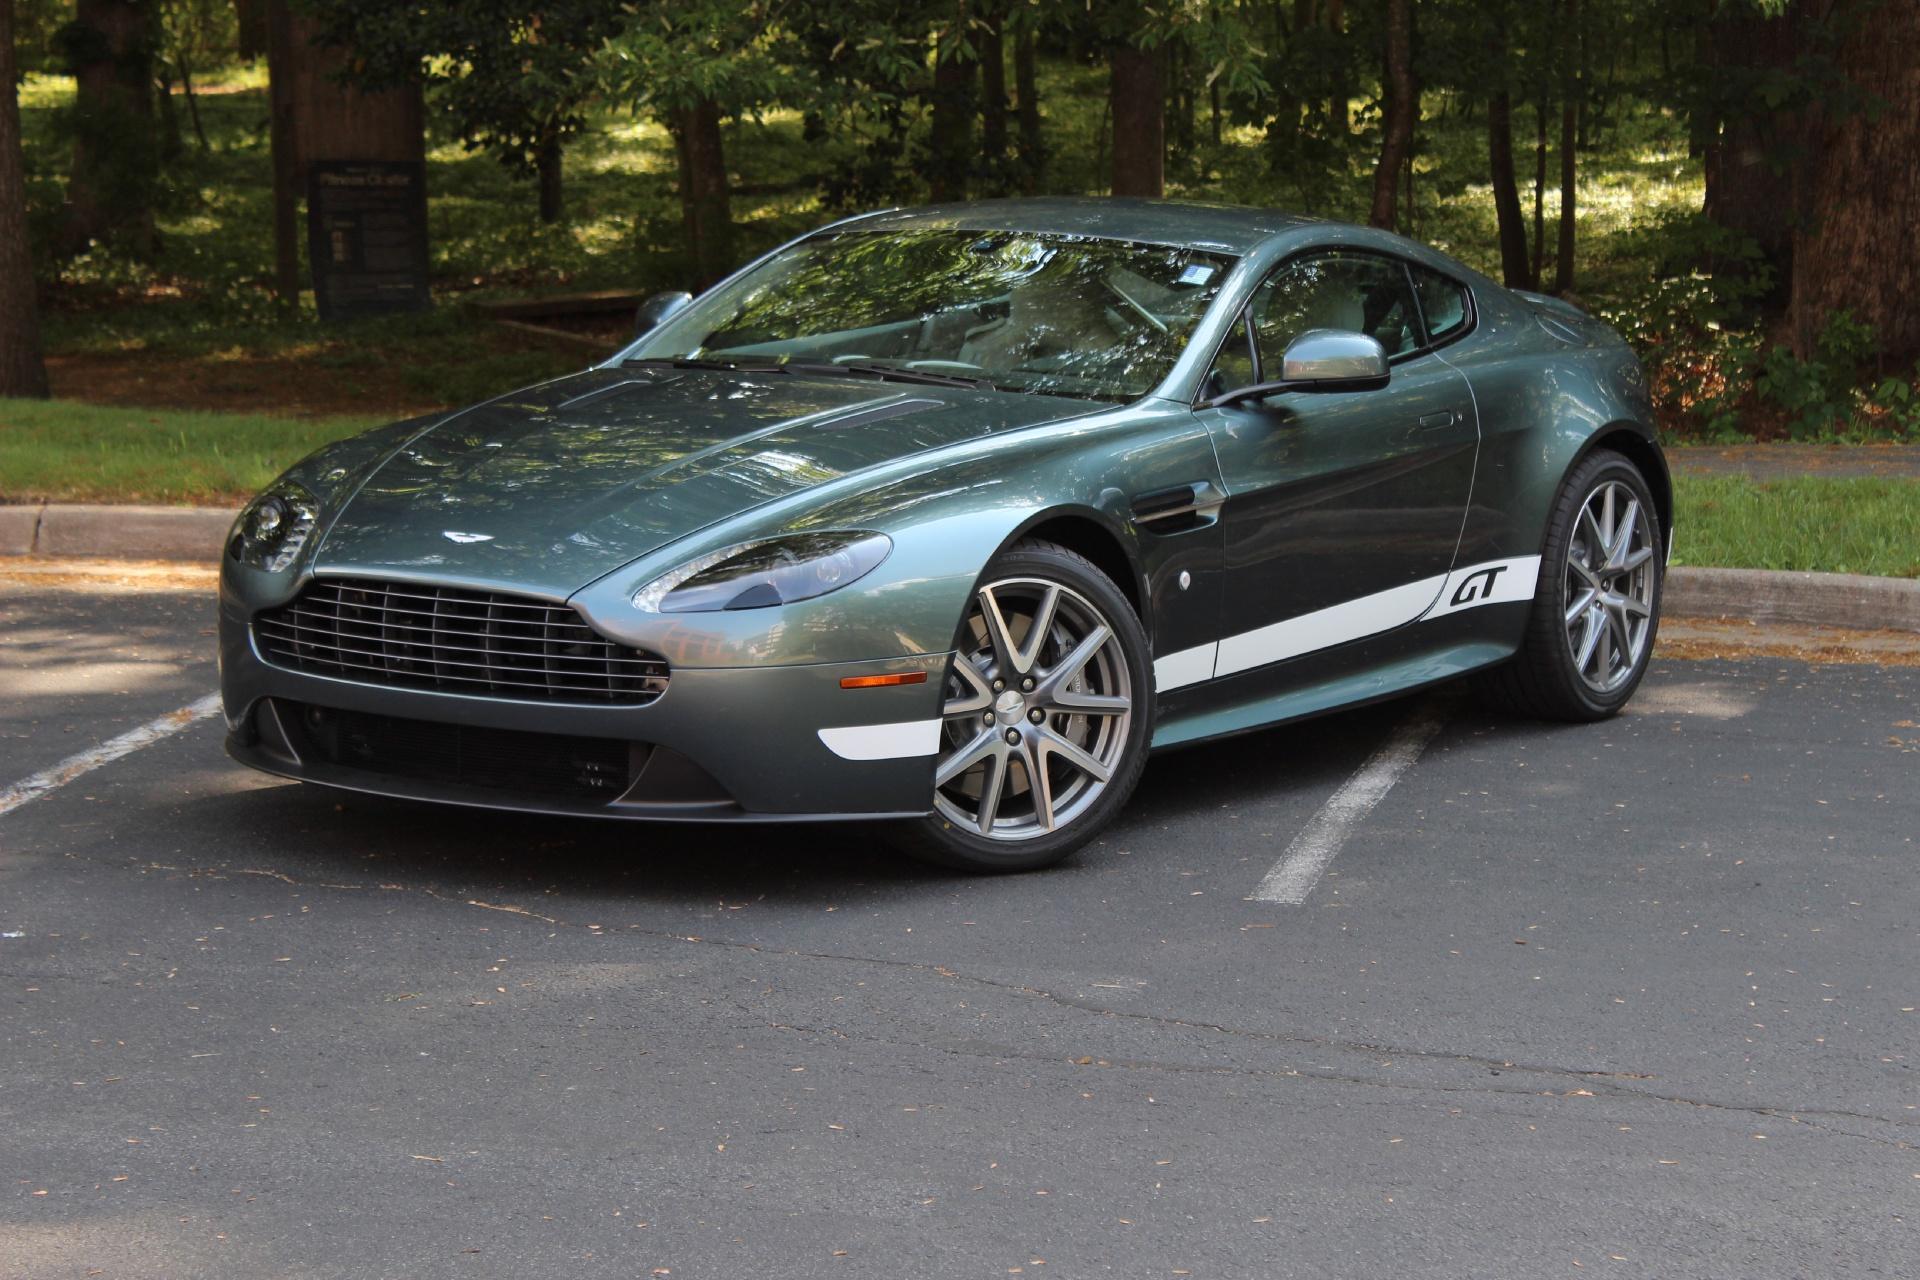 Aston Martin V Vantage GT Stock C For Sale Near Vienna - Aston martin vantage gt